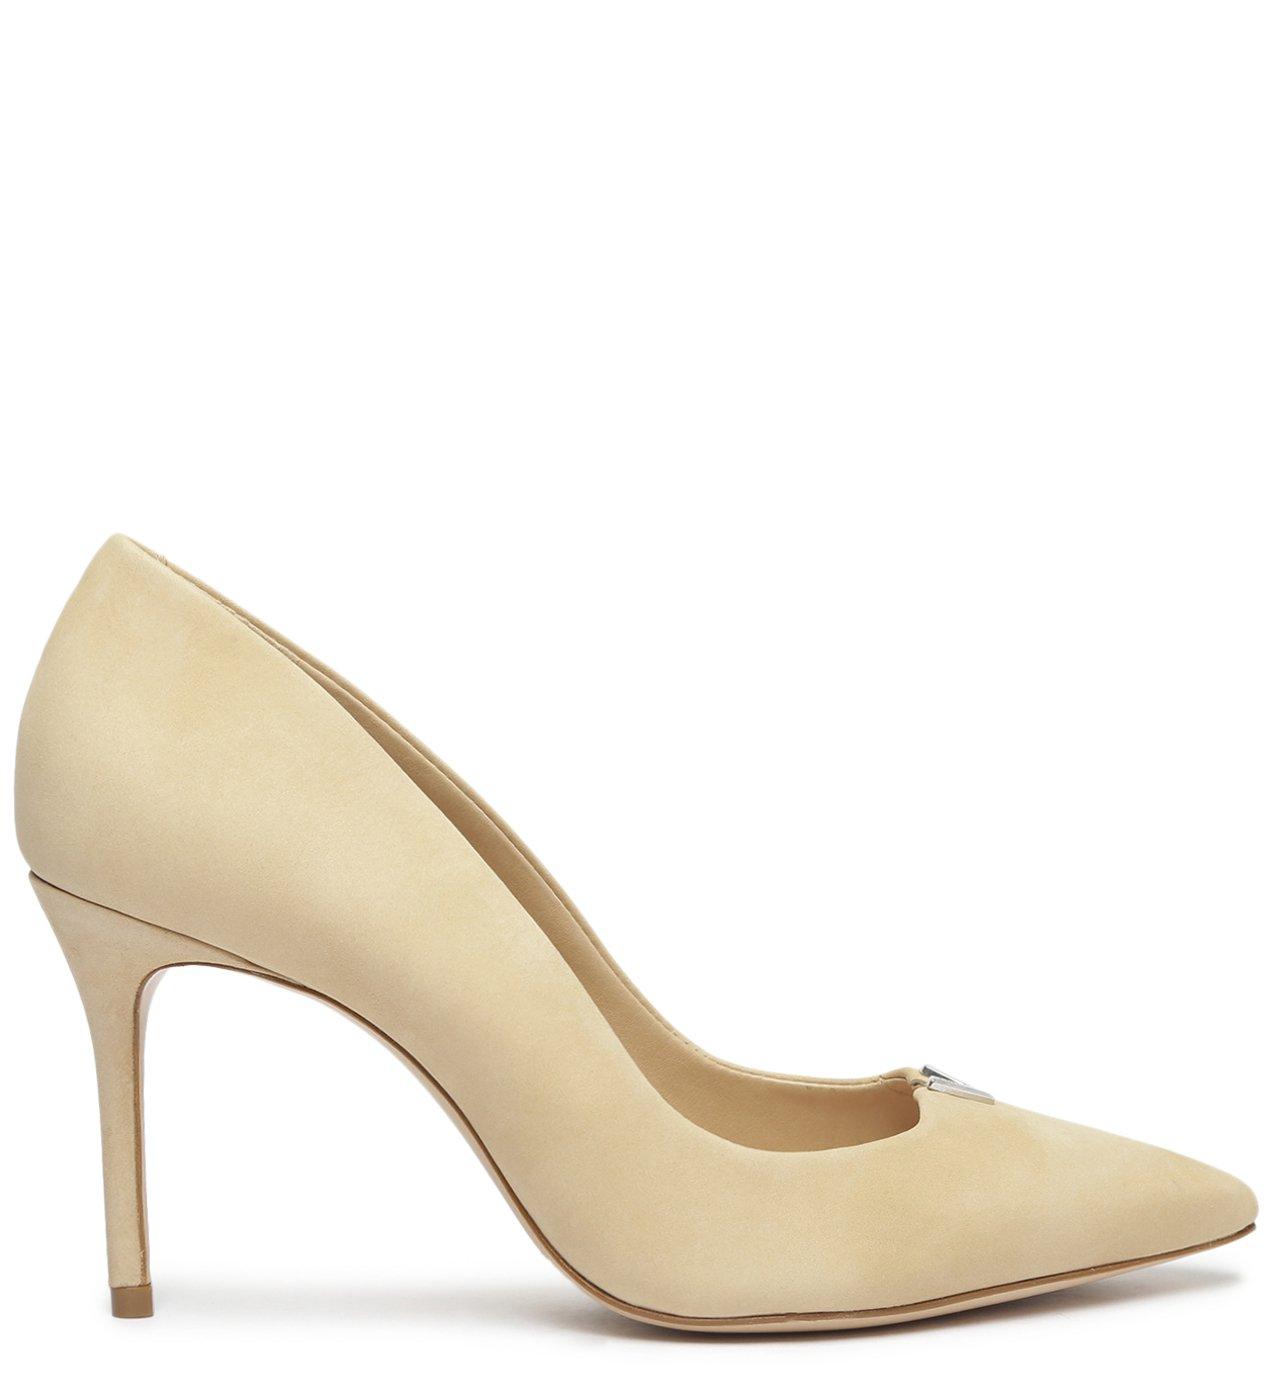 Sapato Scarpin Salto Fino Nobuck Bege | Schutz